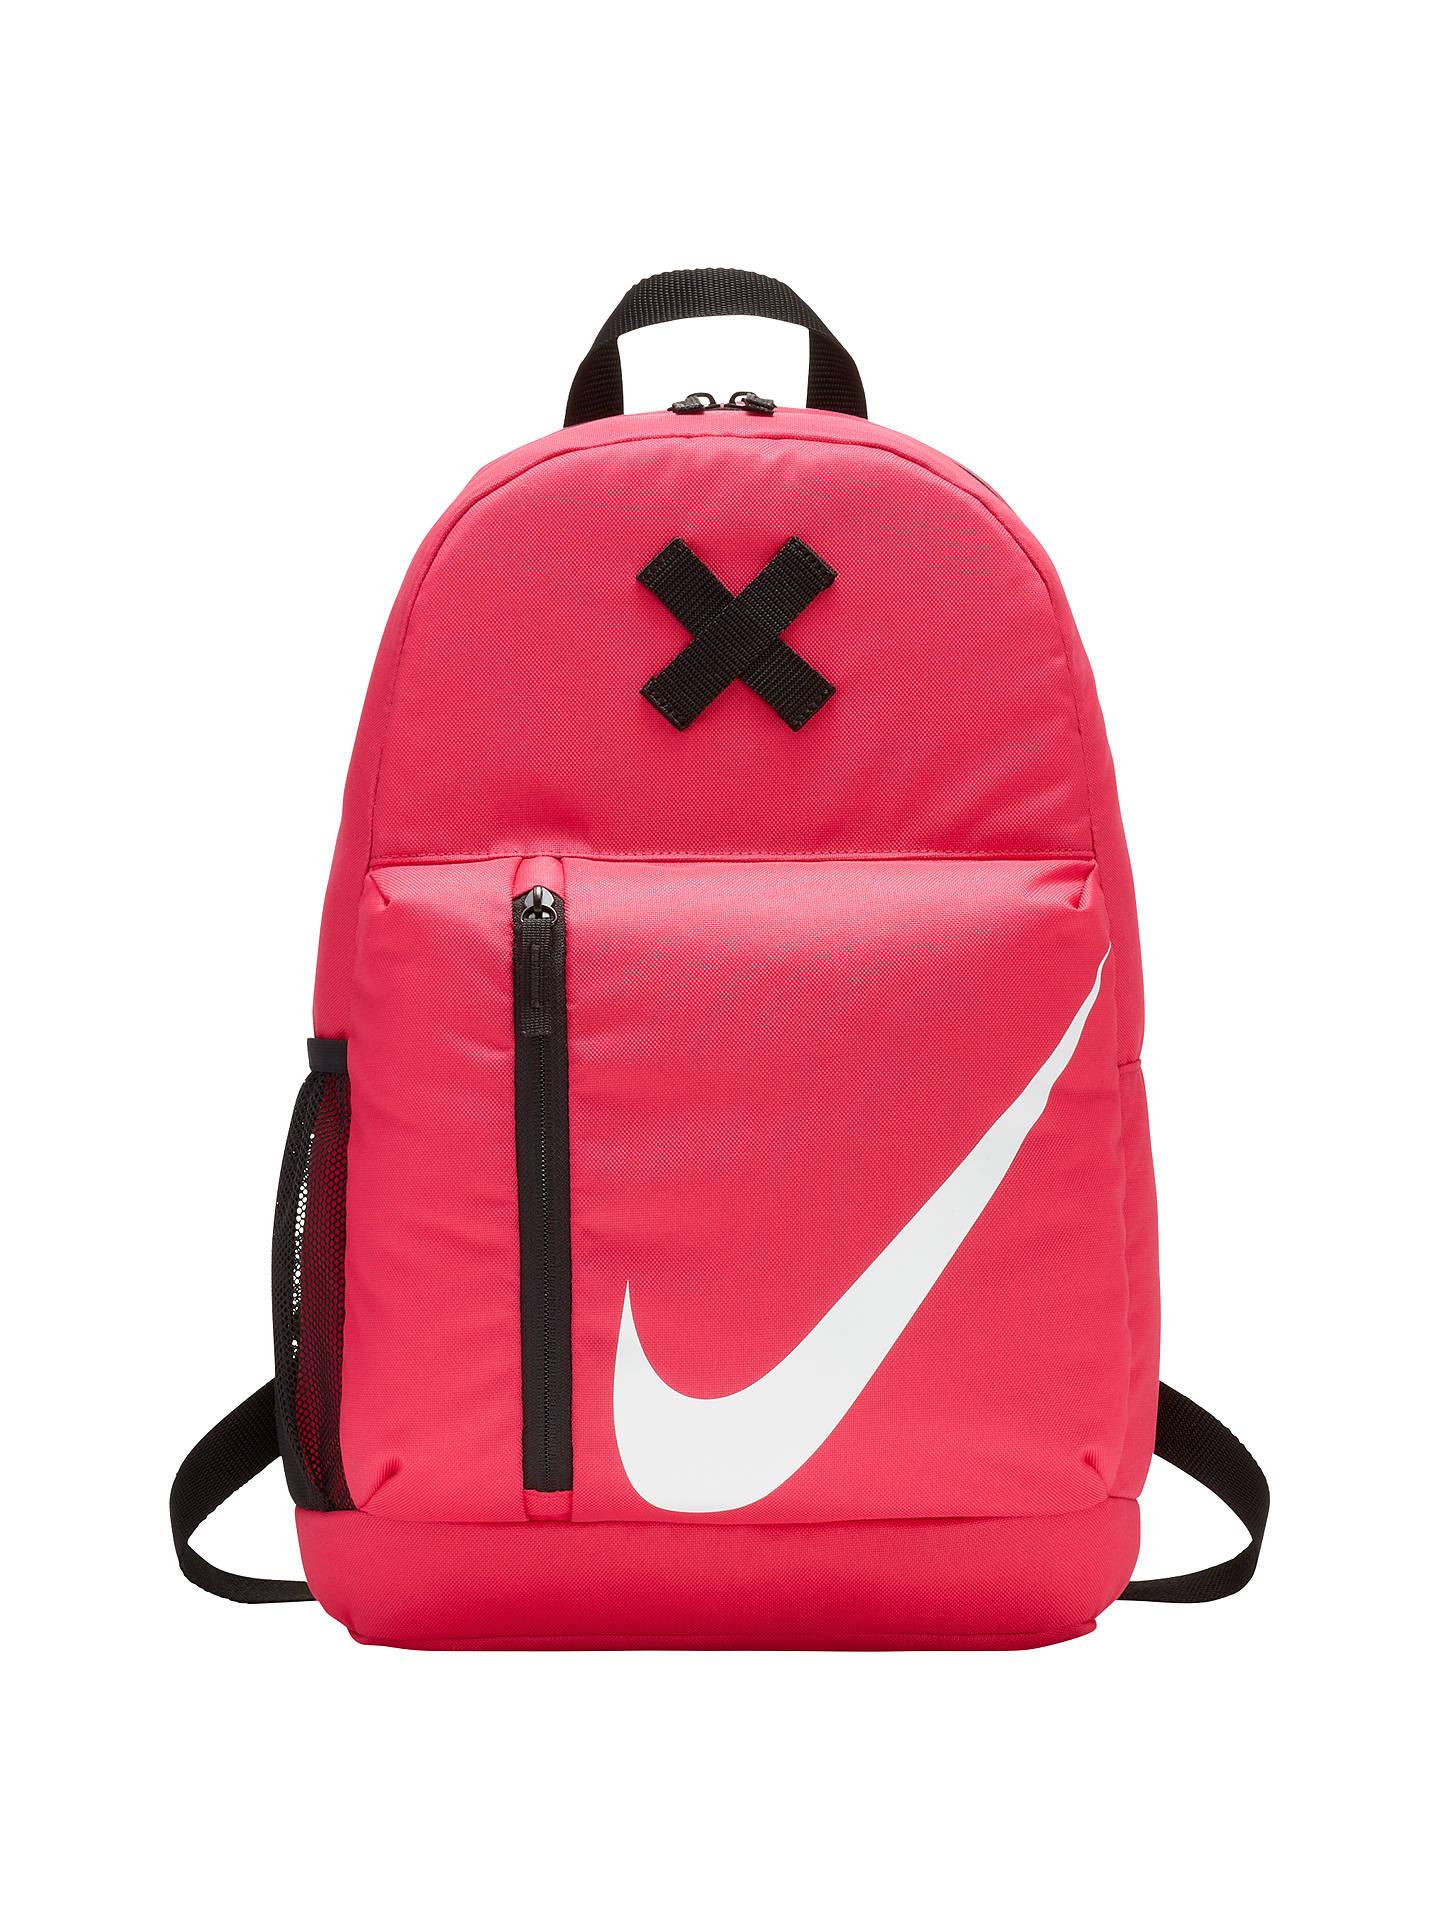 4ec93bf8507 Buy Nike Elemental Children's Backpack, Pink Online at johnlewis. ...